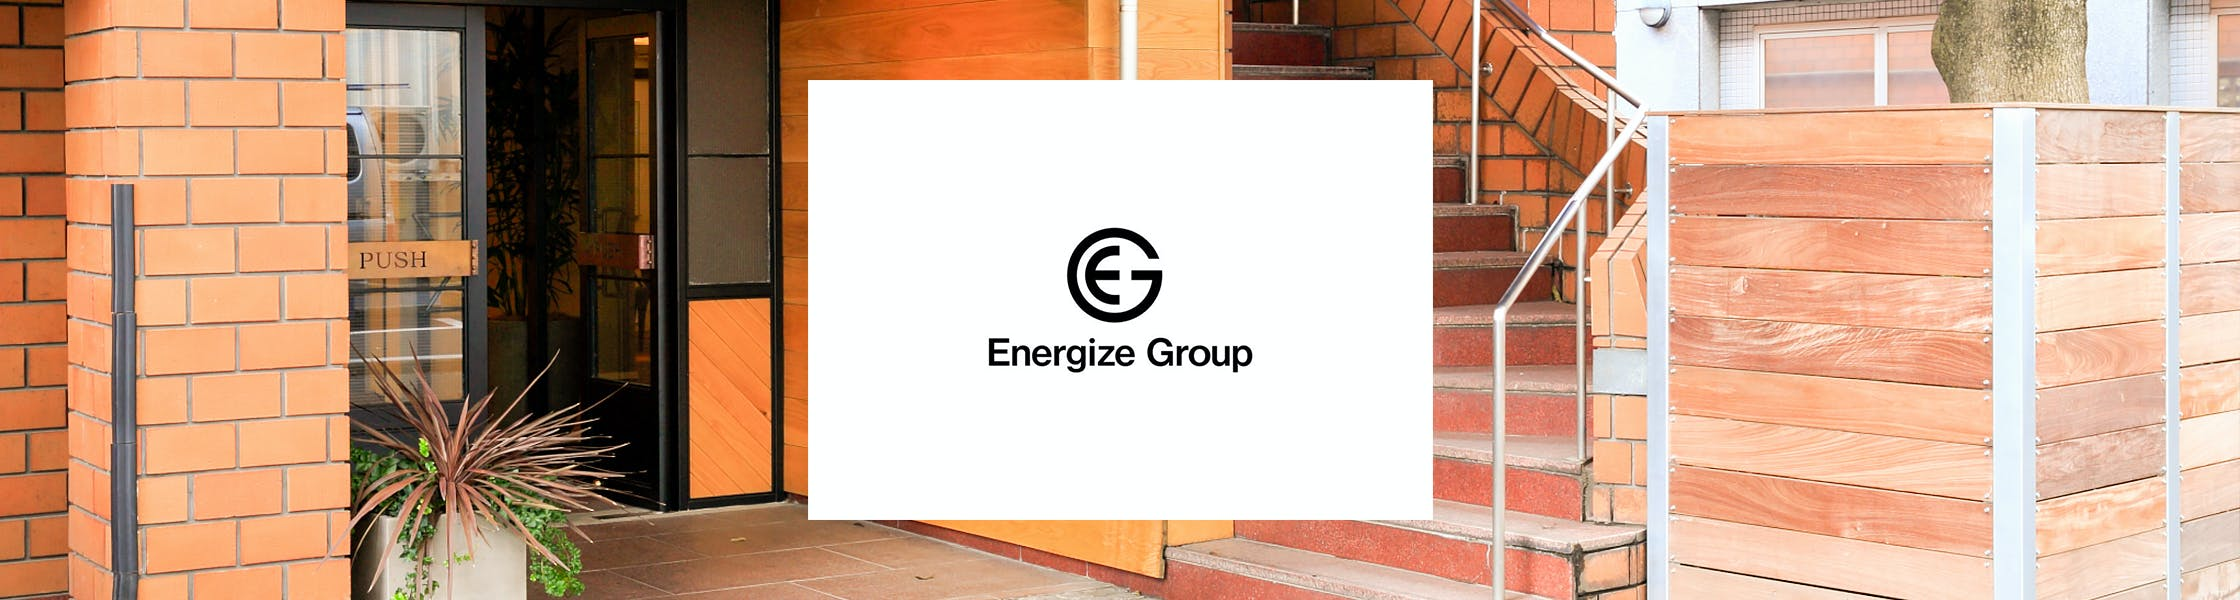 Energize 1120x300 2x.jpg?ixlib=rails 3.0